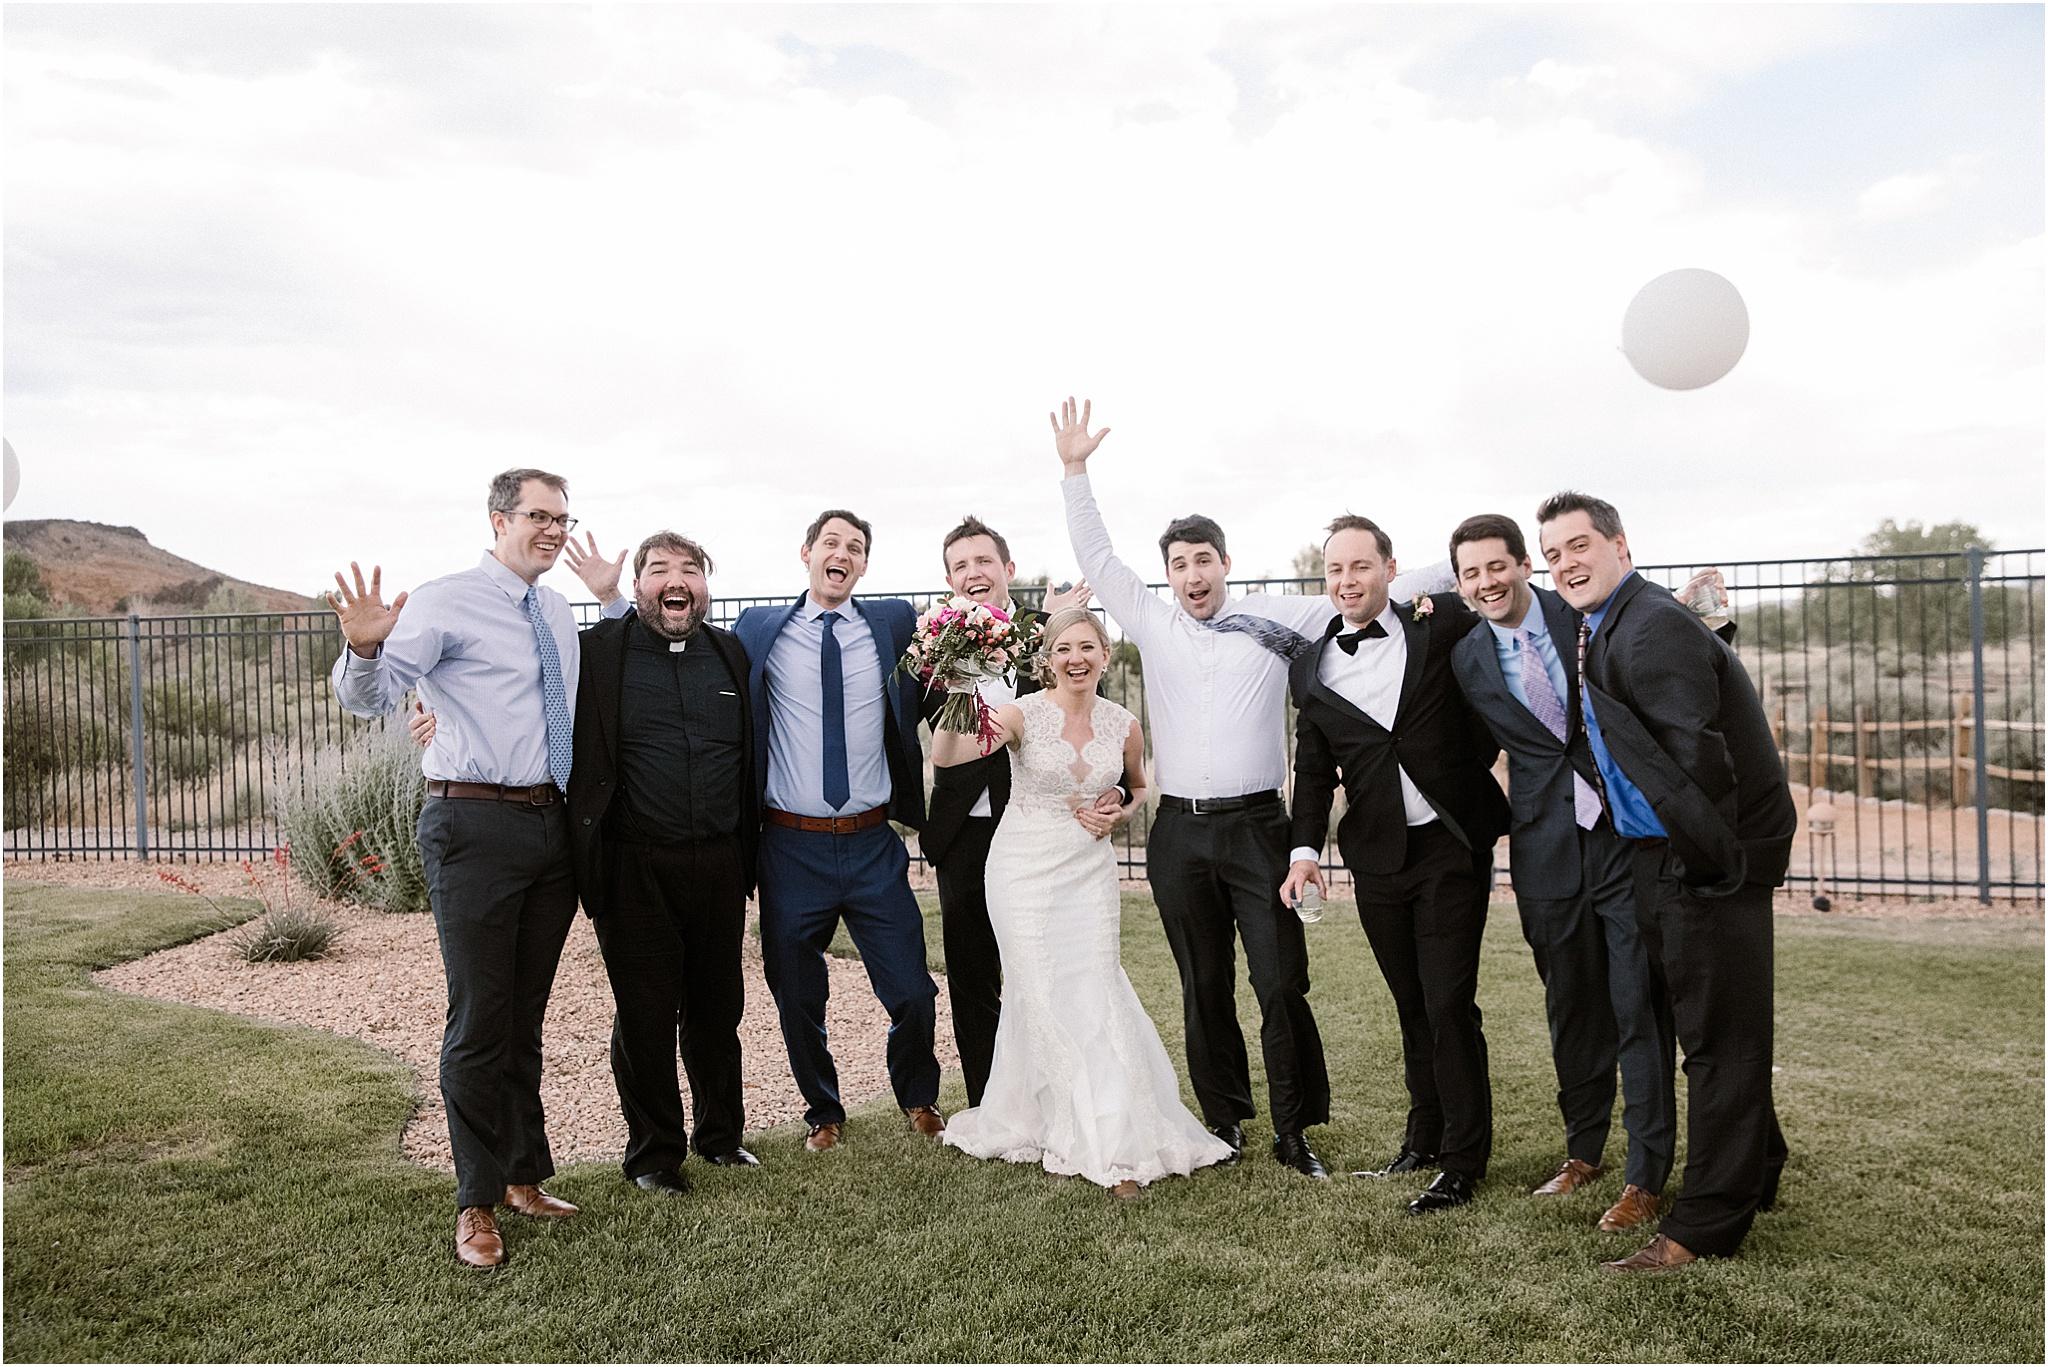 JENNA_JEROME_BLUE ROSE PHOTOGRAPHY_ABQ WEDDING_50